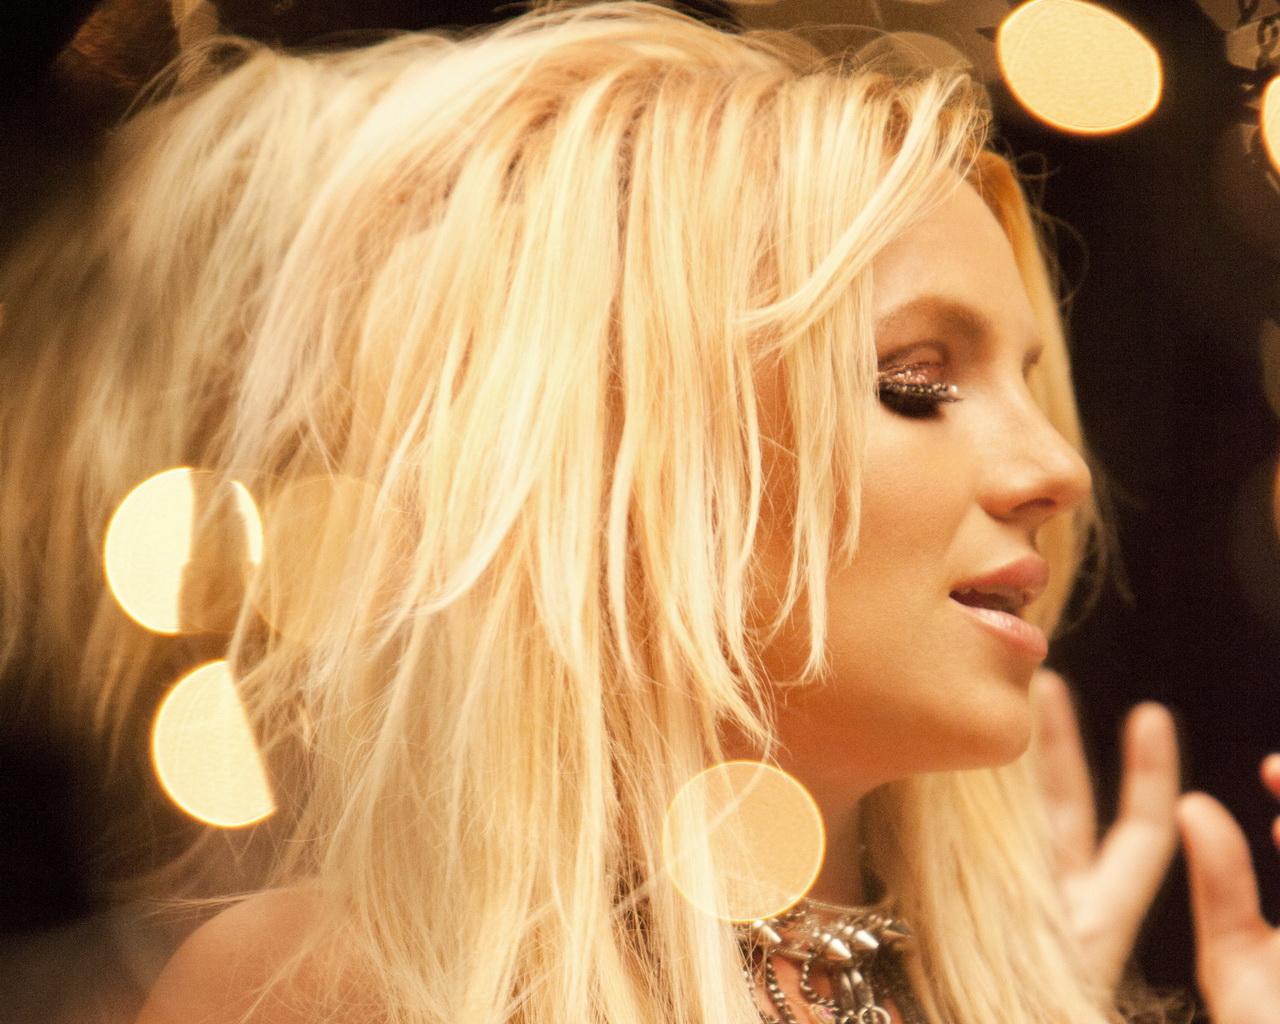 Britney Spears Wallpaper 4